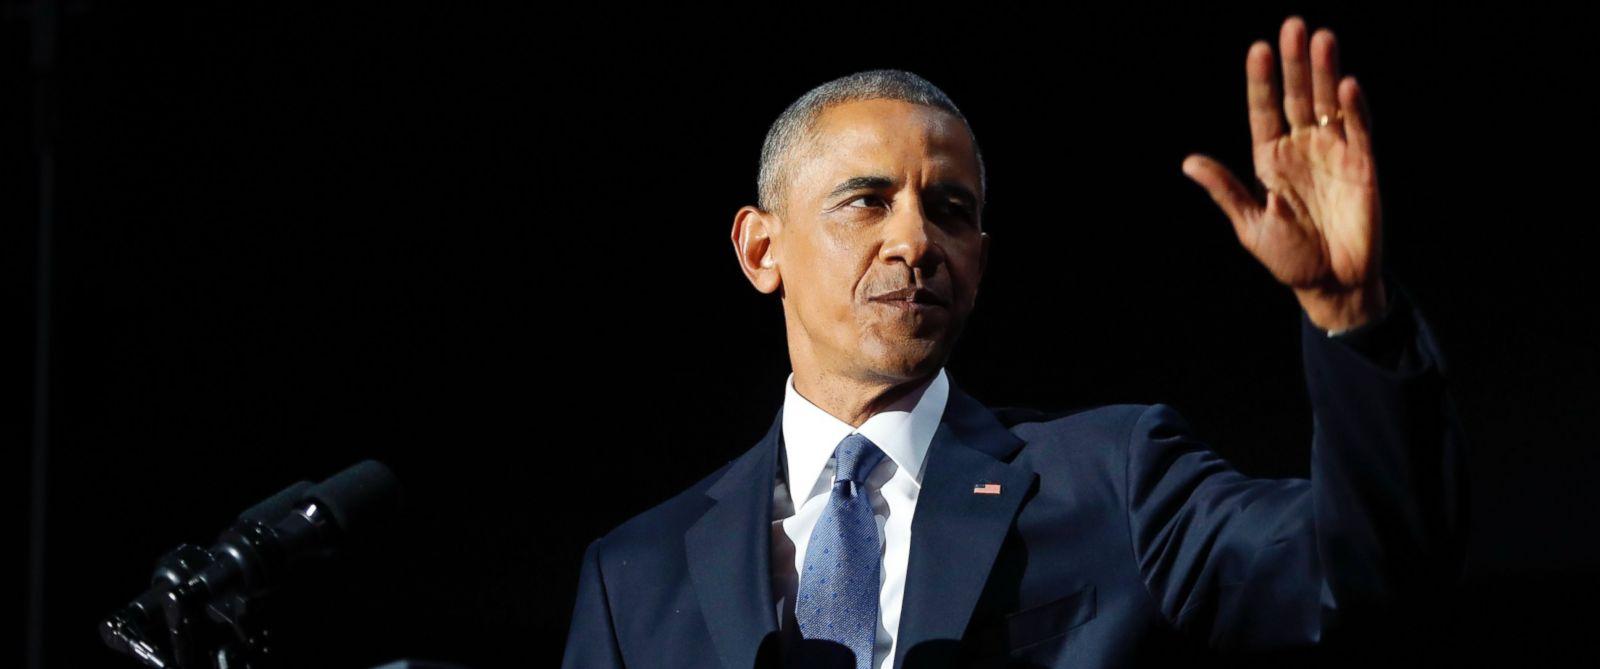 Obama's Final Weeks As President